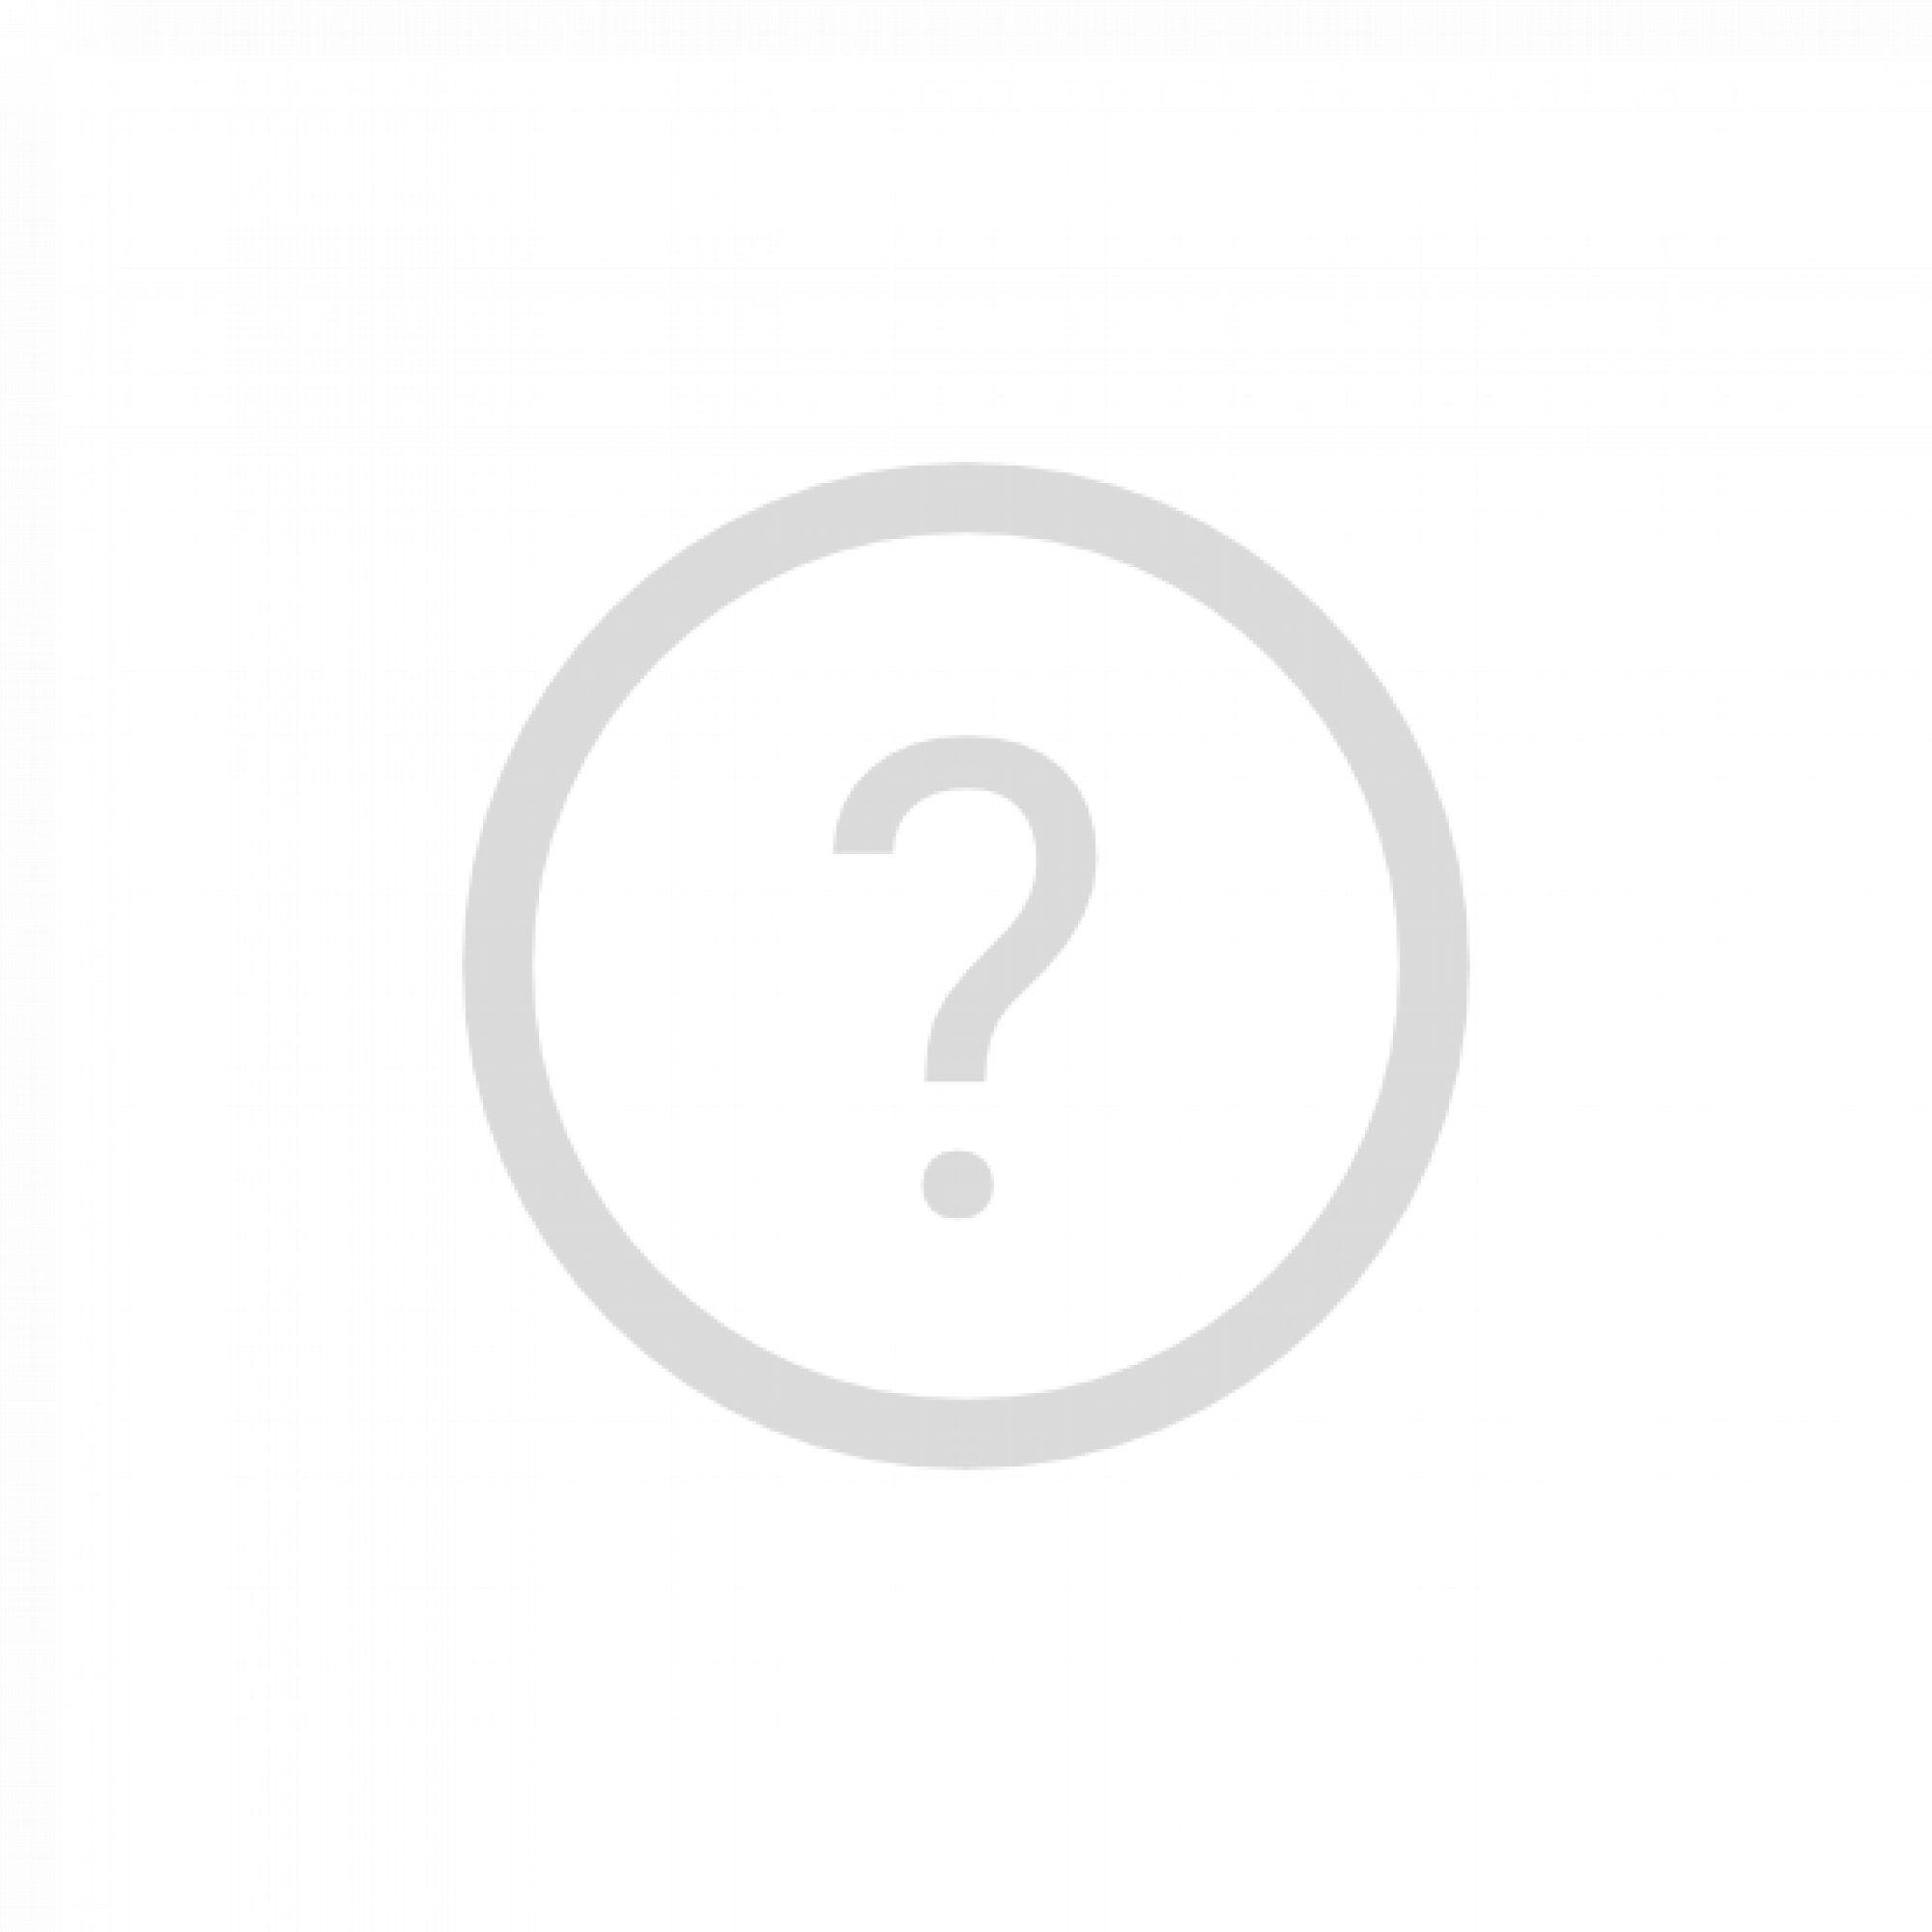 wheelworld wh11 felgen daytona grau lackiert in 19 zoll. Black Bedroom Furniture Sets. Home Design Ideas